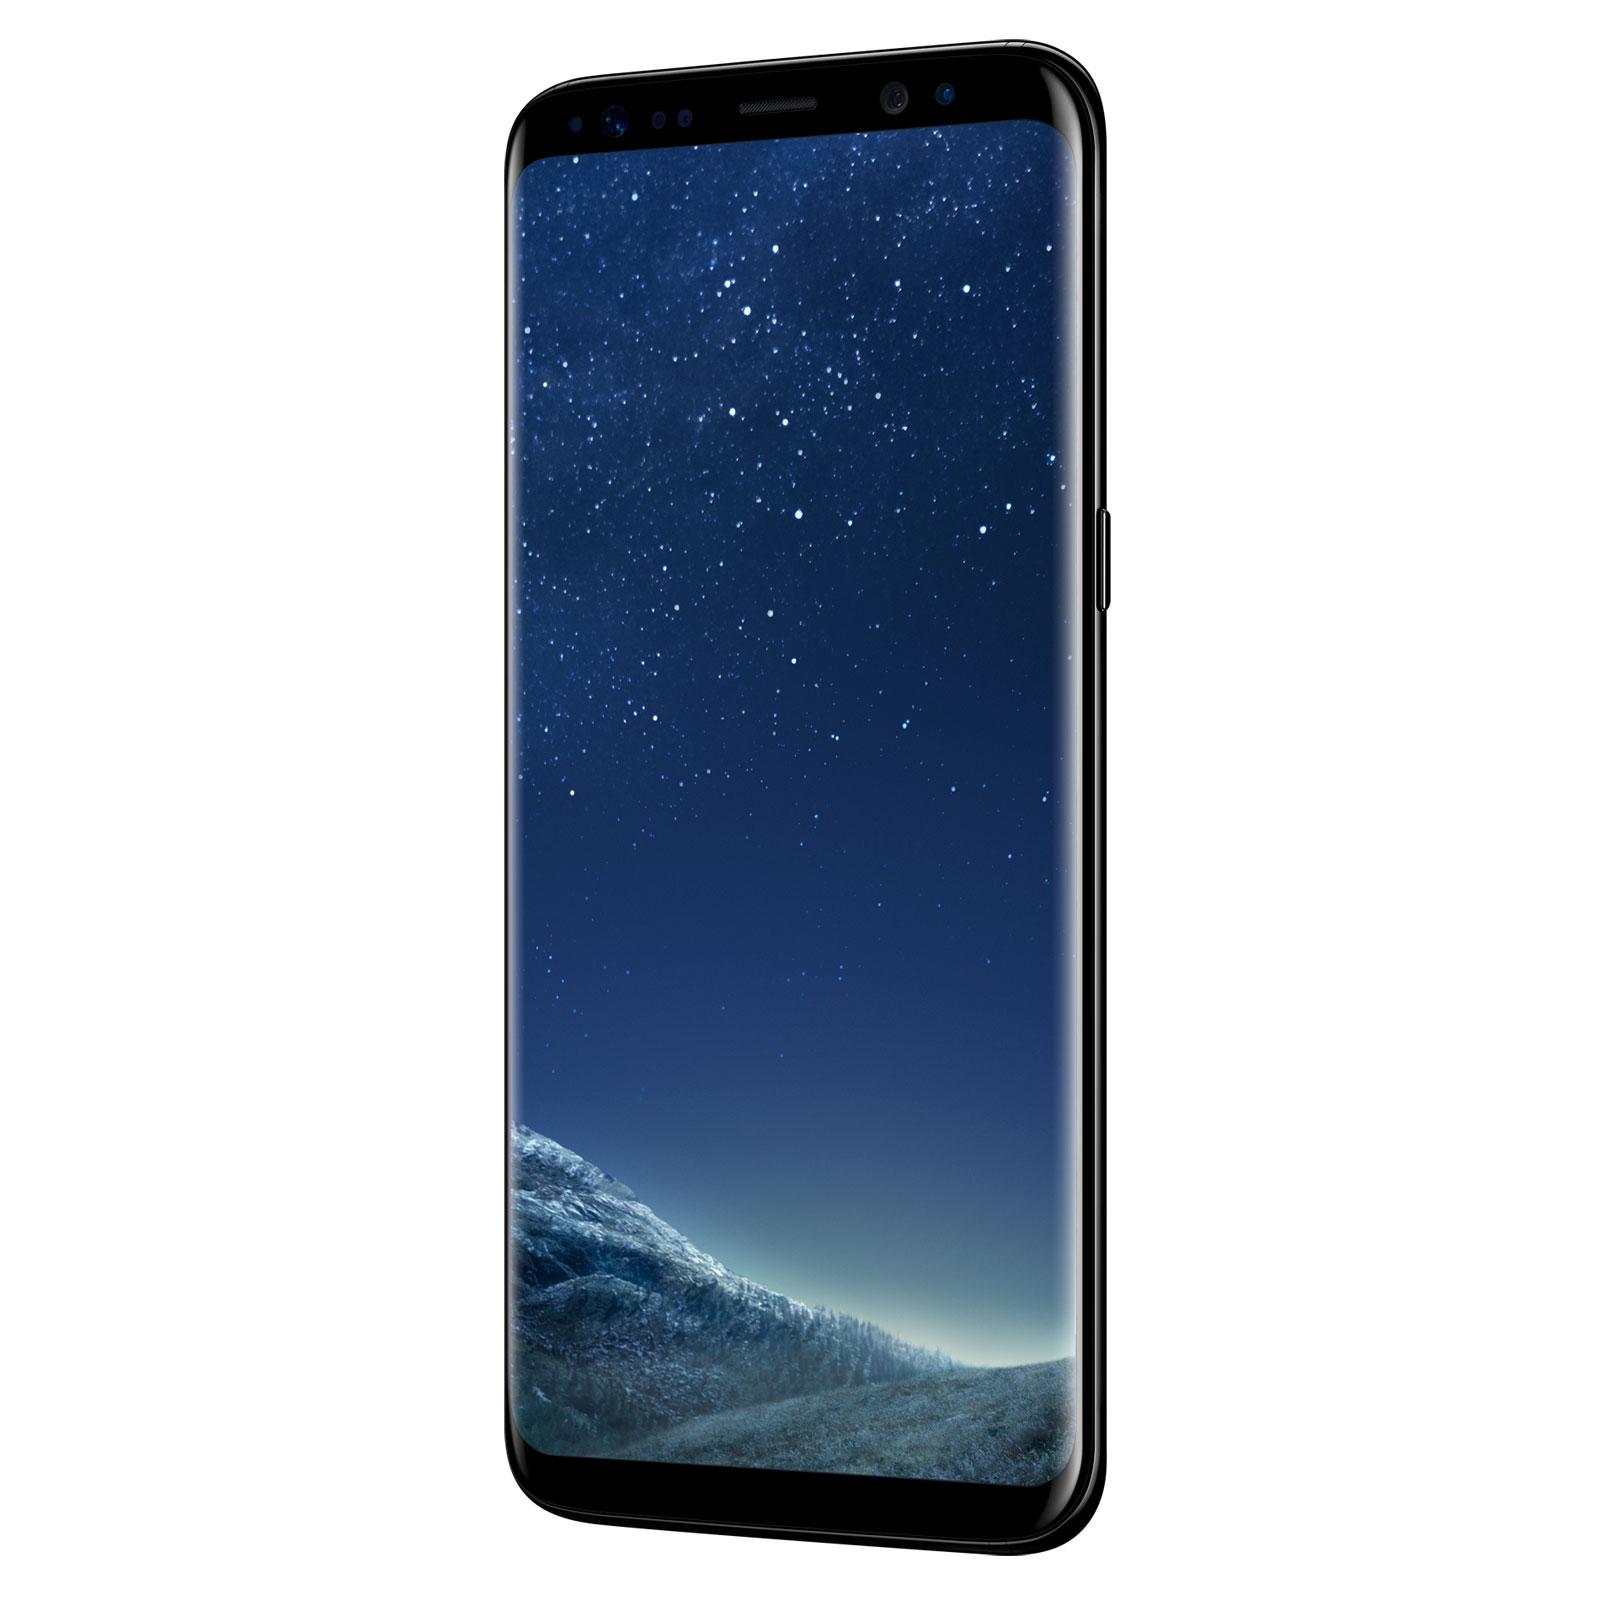 Samsung Galaxy S8 64Go G950 Black - Téléphonie Samsung - 3